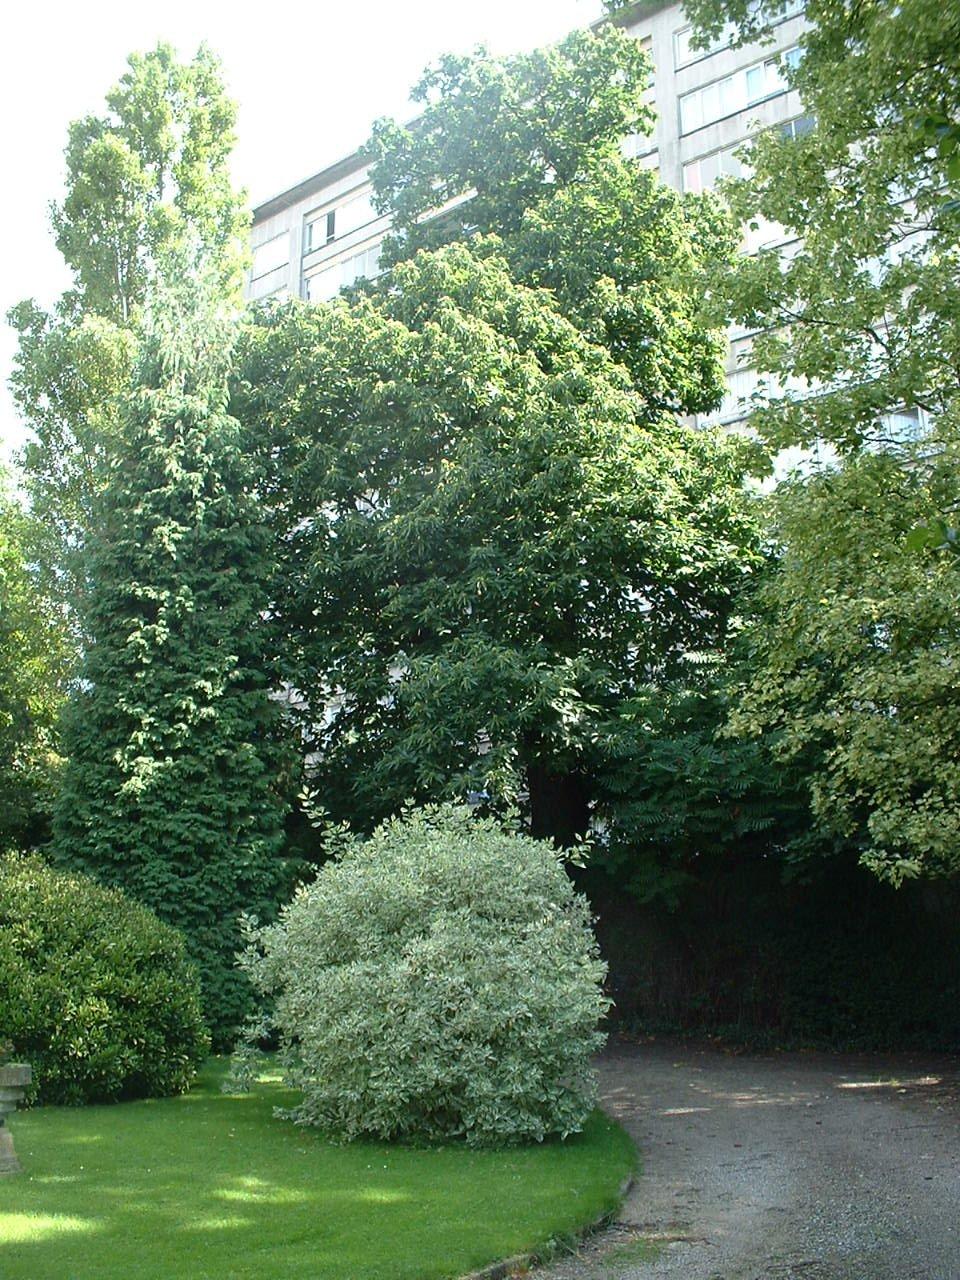 Châtaignier – Jette, Rue Gustave Gilson, 55 –  04 Août 2005